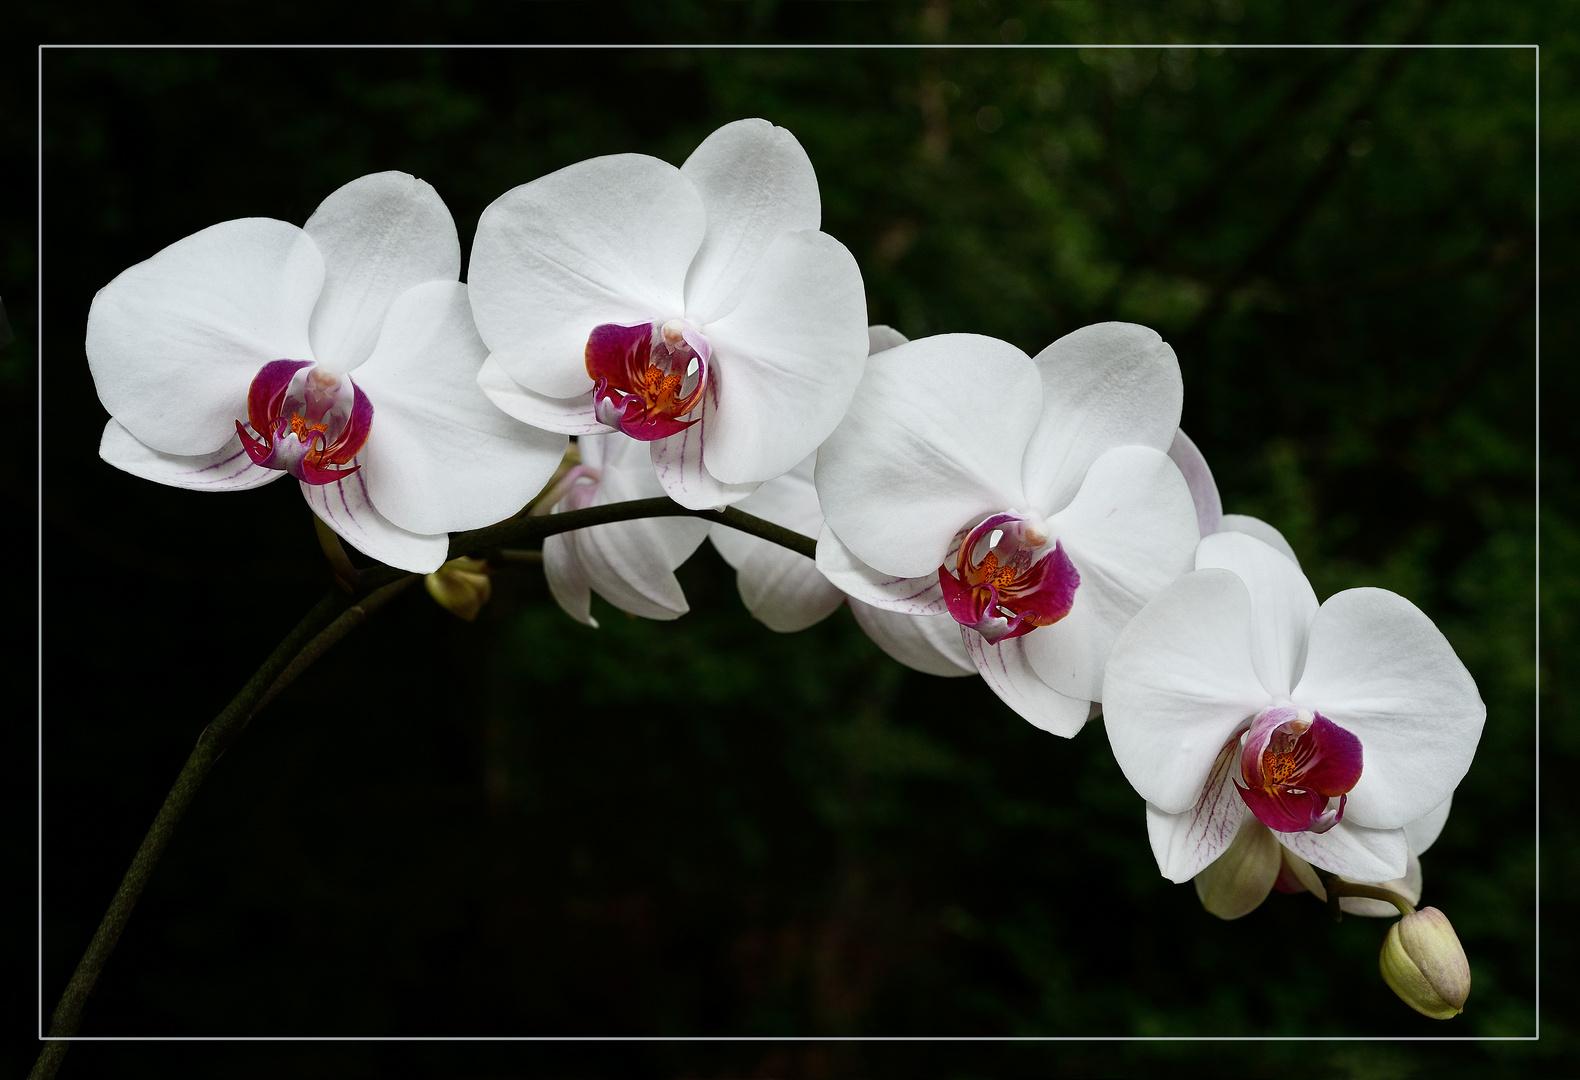 phalaenopsis orchideen in weiss foto bild pflanzen. Black Bedroom Furniture Sets. Home Design Ideas